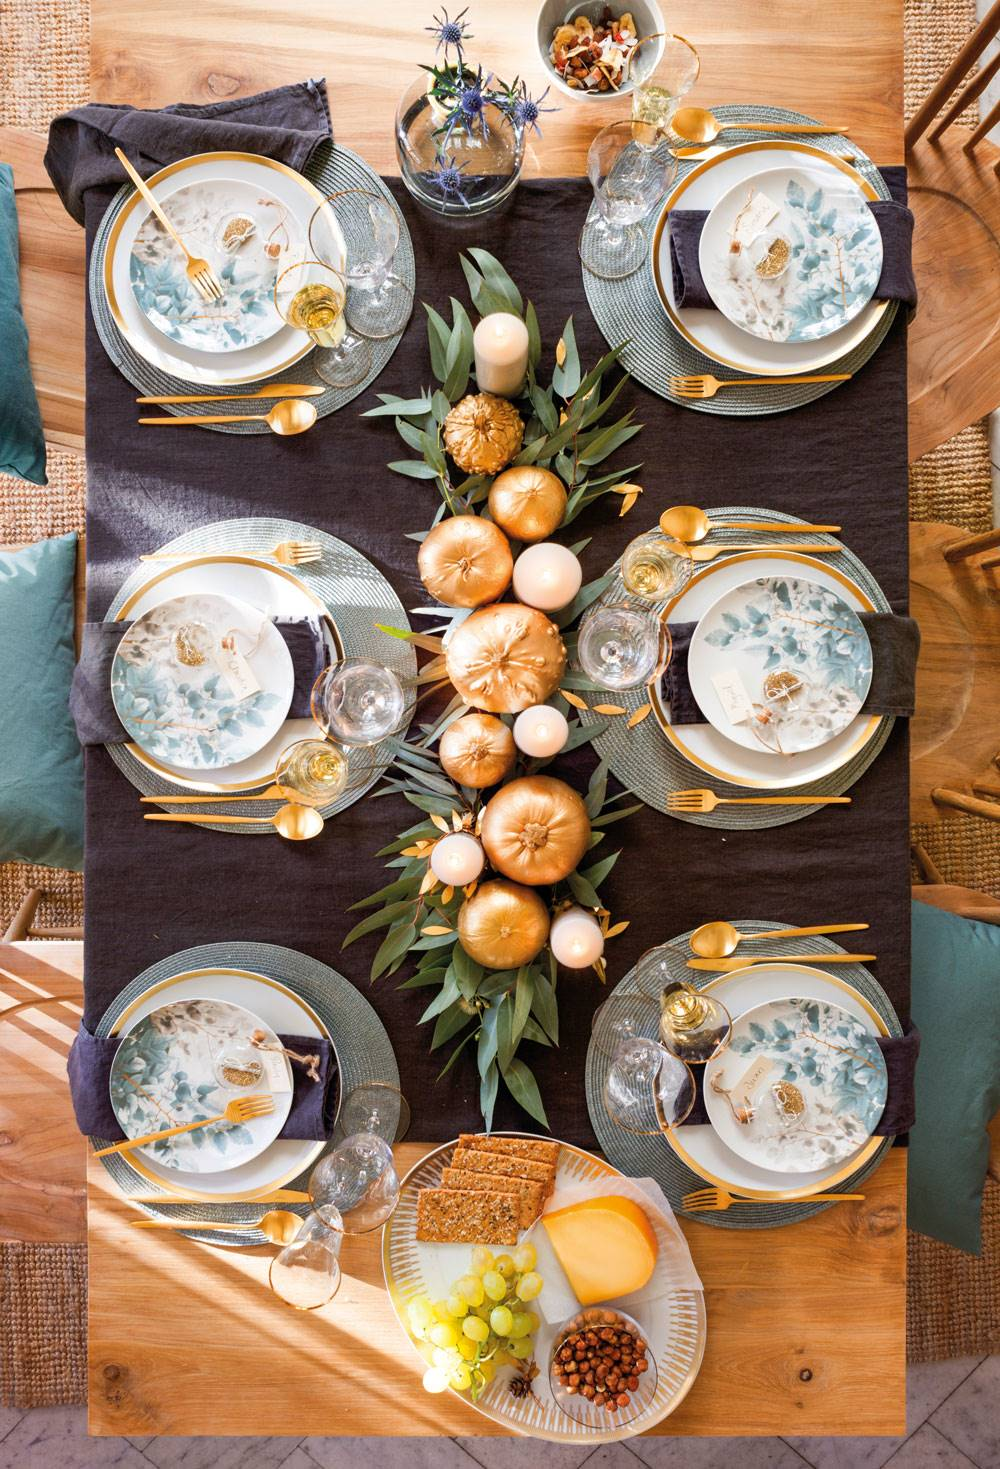 Comedor-Navidad-00470951. Un centro de mesa navideño muy natural